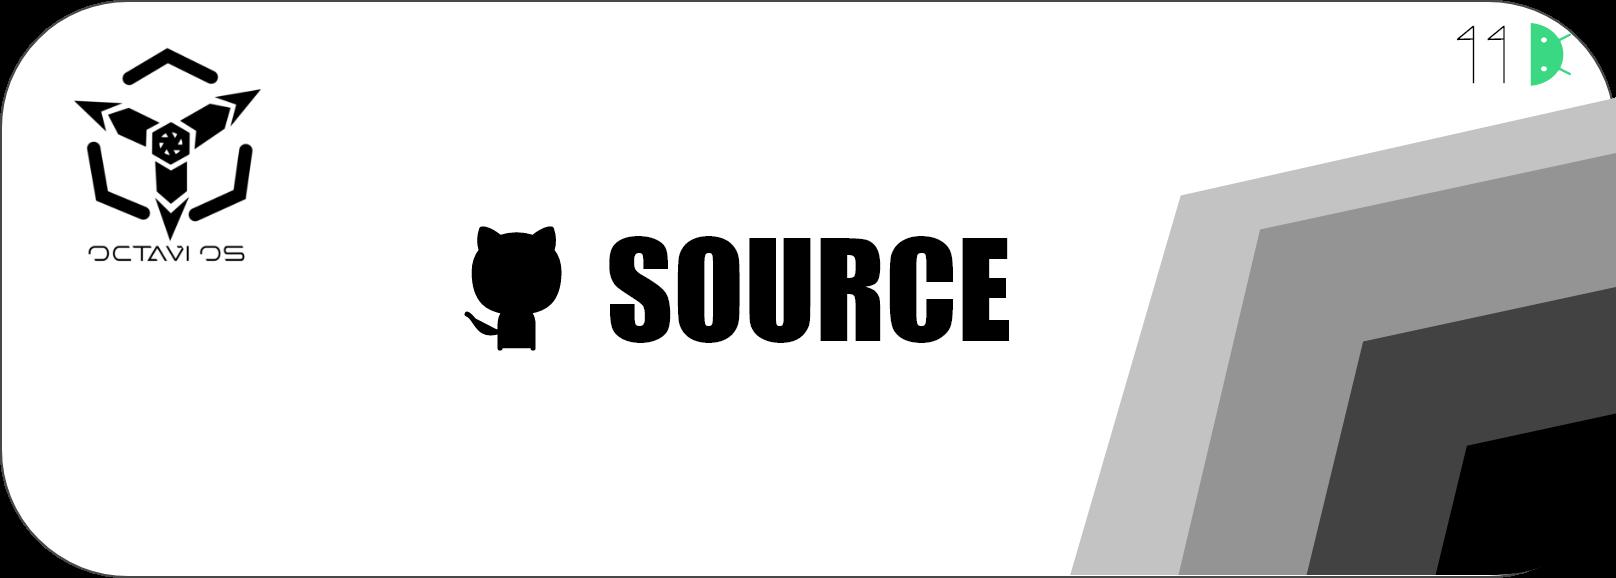 Source.png